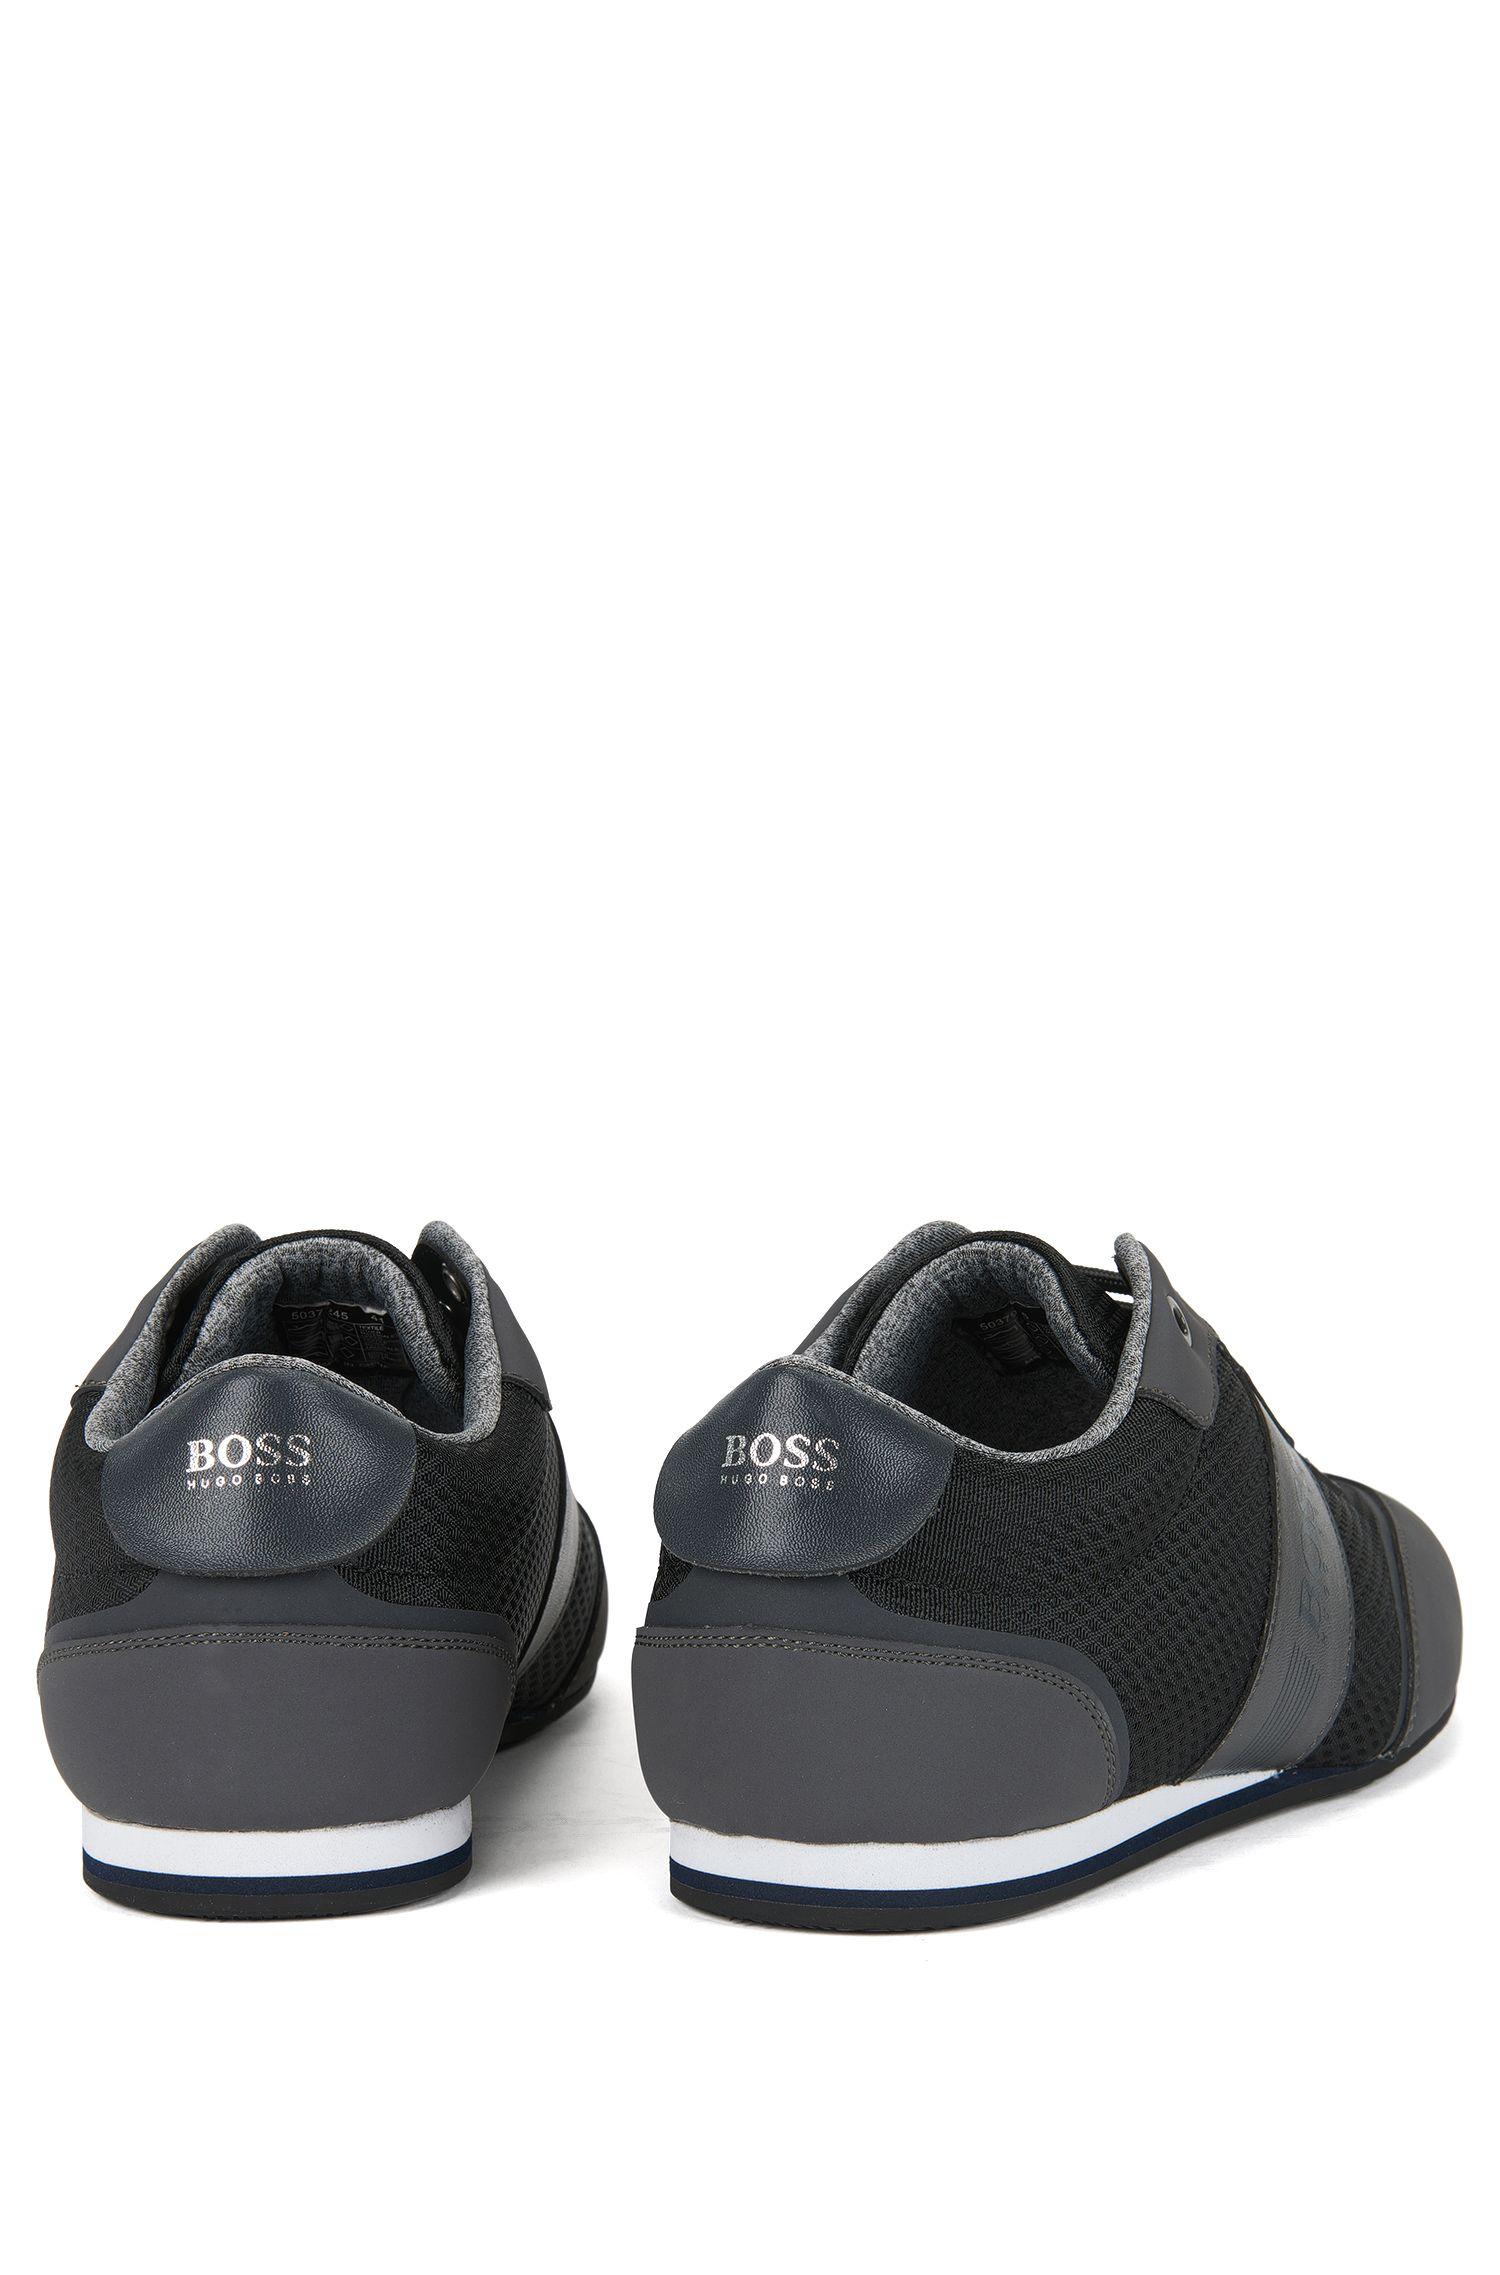 Sneakers aus Nylon mit Kunstleder-Detail an den Flügelkappen